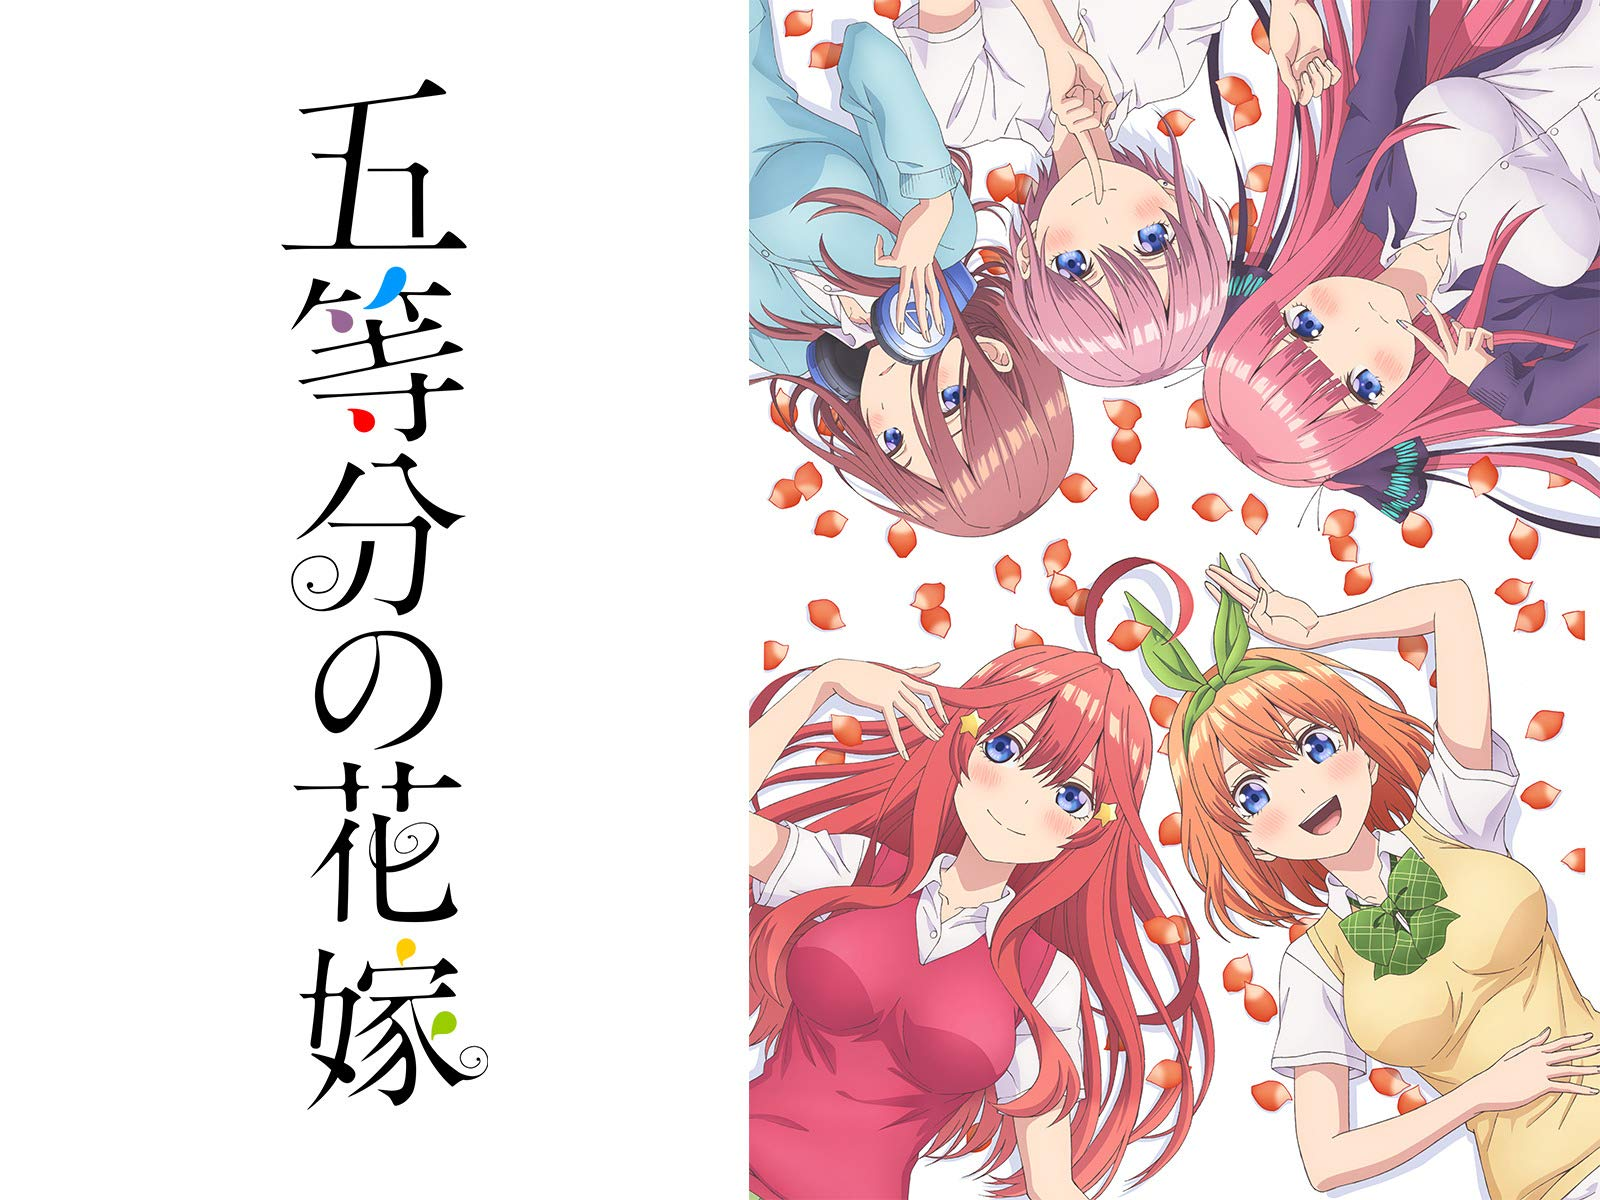 Amazon.co.jp: 五等分の花嫁を観る | Prime Video